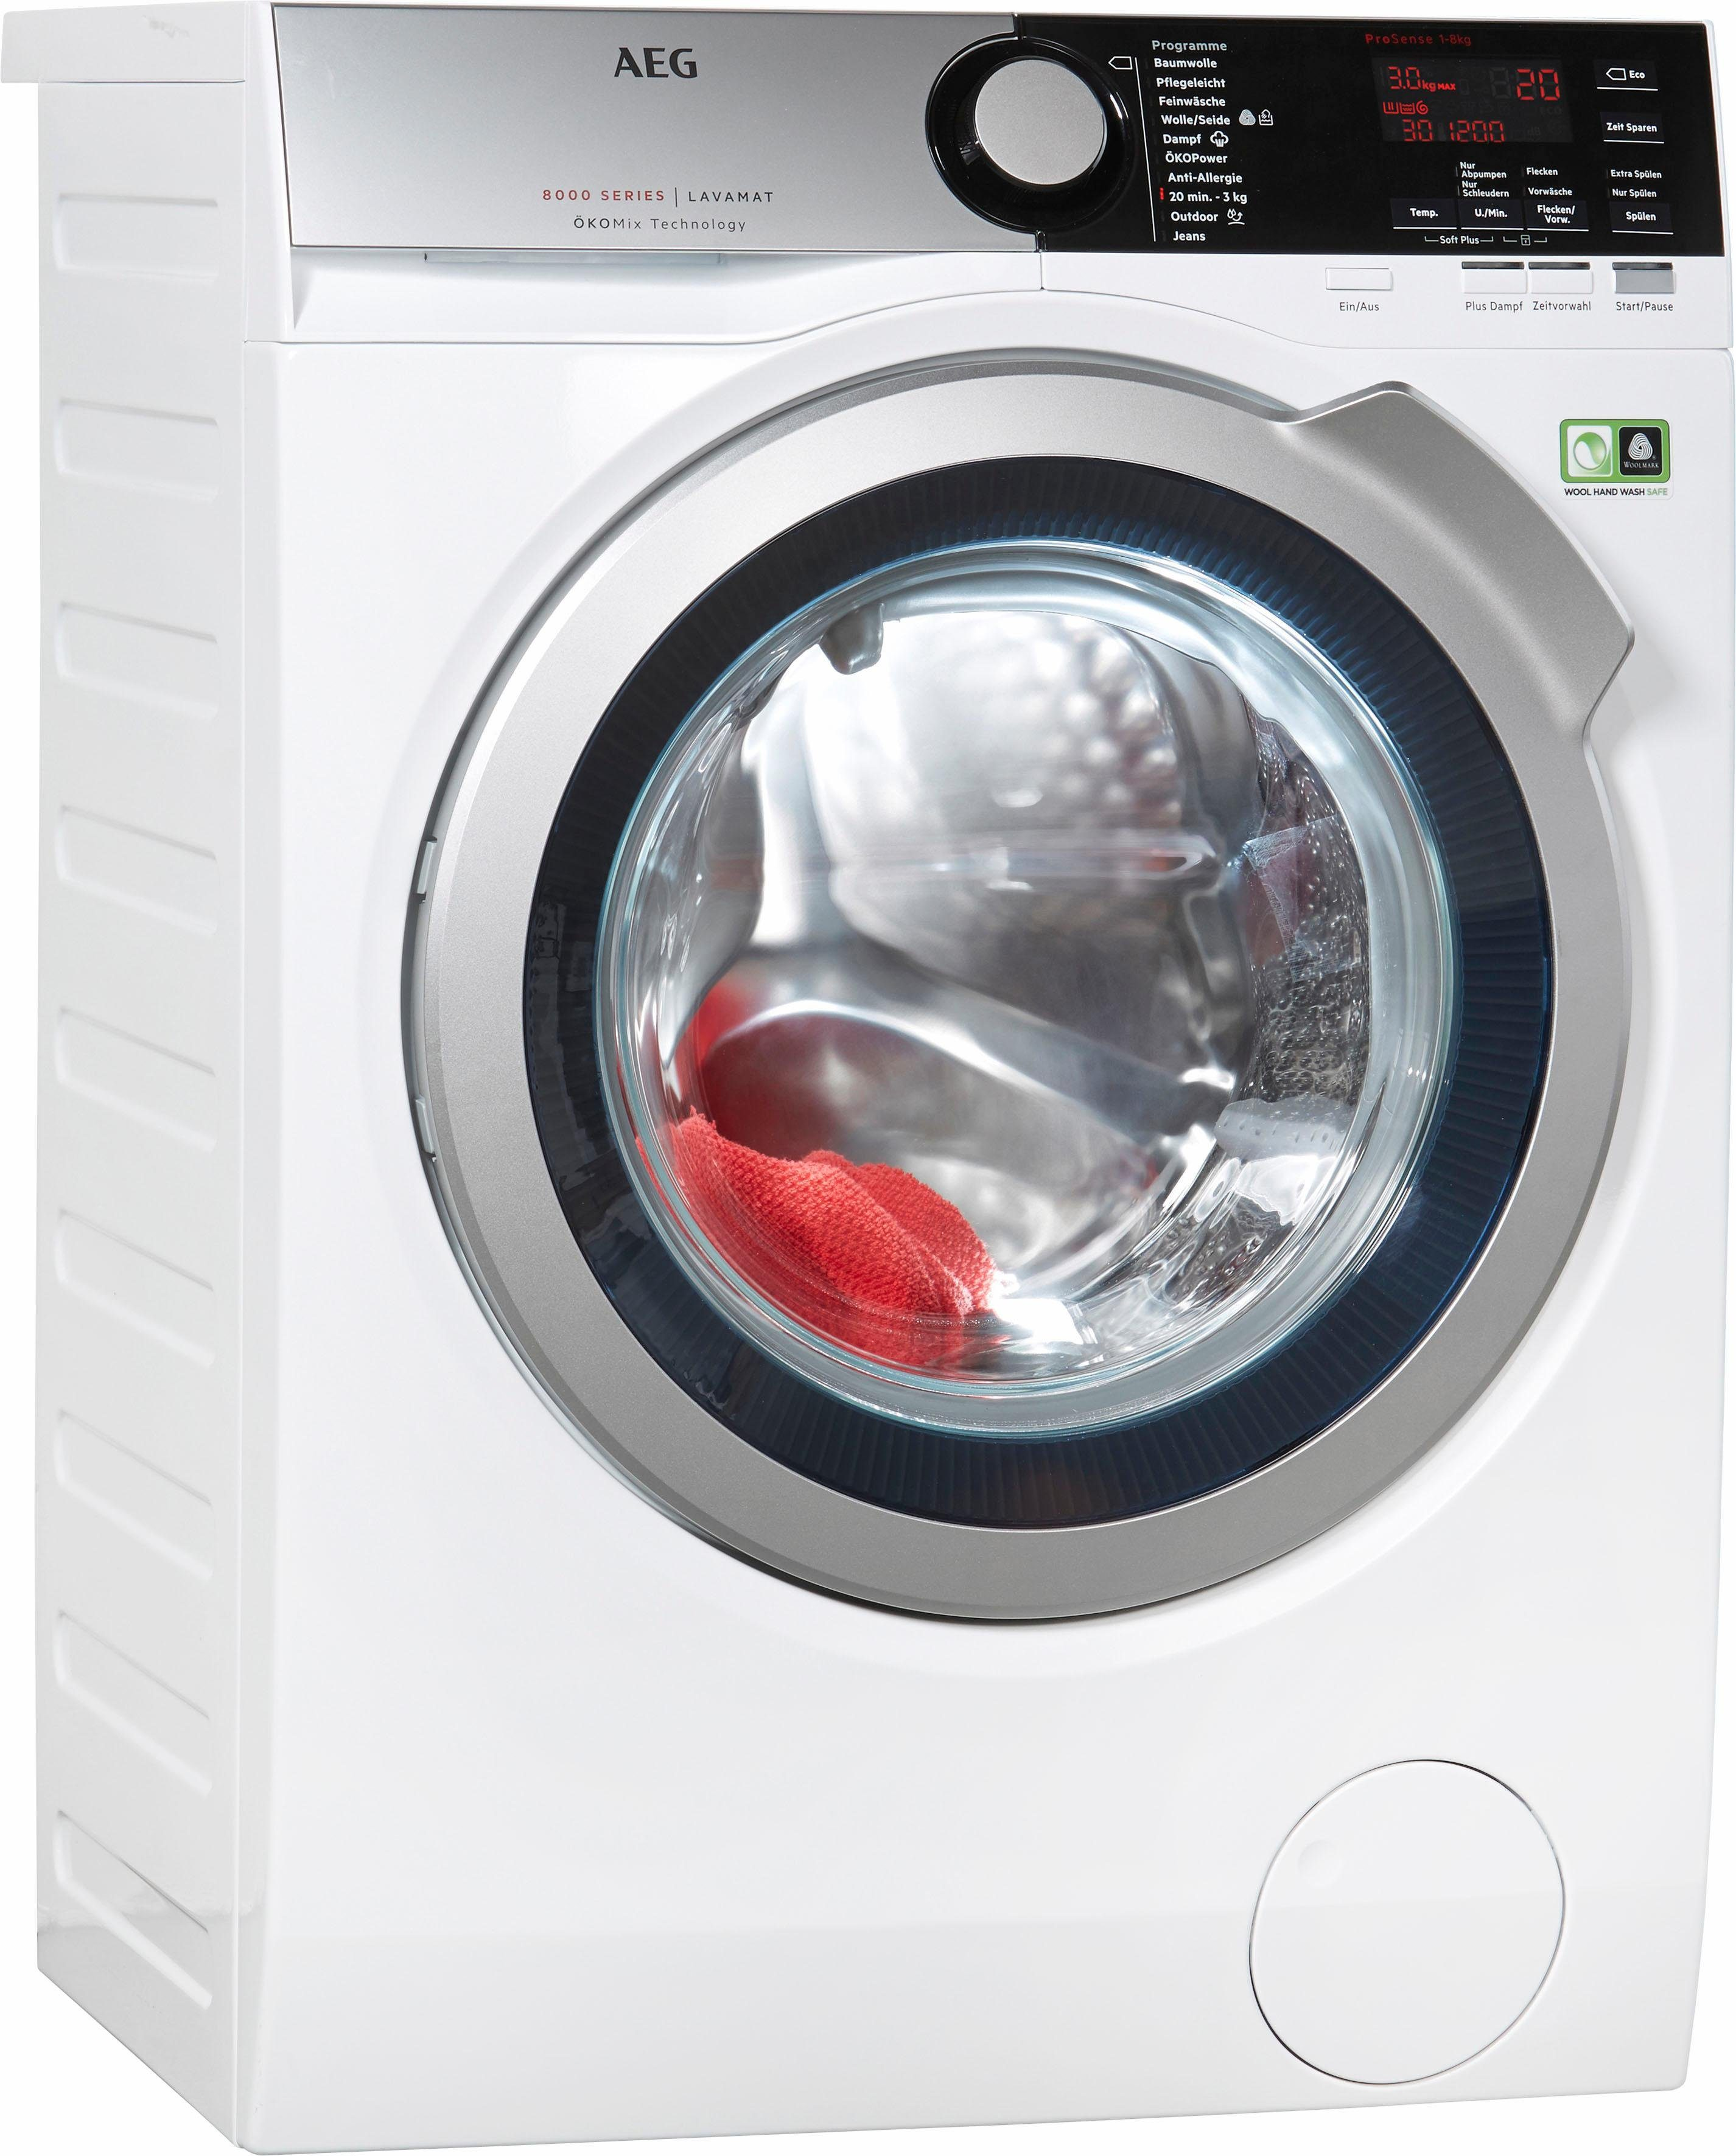 AEG Waschmaschine Serie 8000 L8FE48OkoM, 8 kg, 1400 U/Min, Stiftung Warentest Gut (2,0)